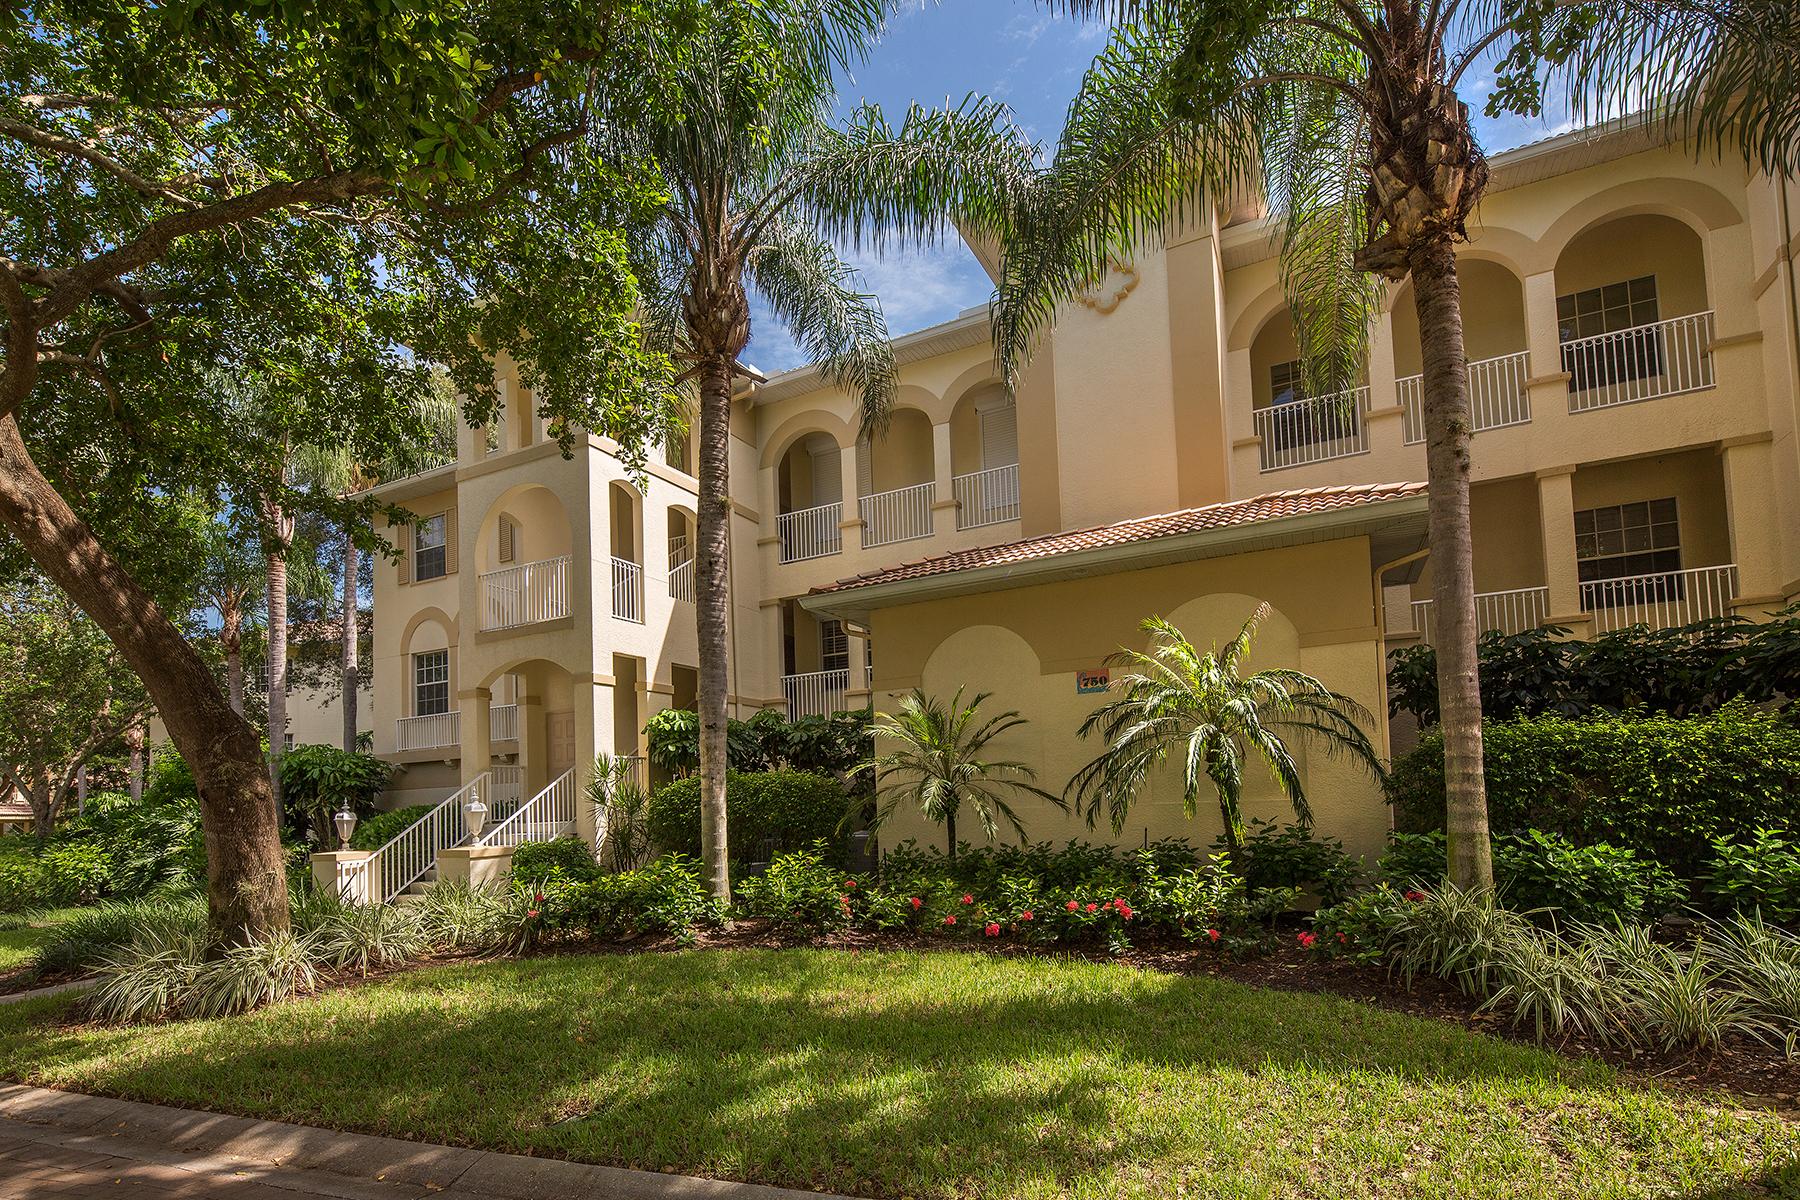 Condominium for Sale at PELICAN BAY - BREAKWATER 750 Bentwater Cir 7-101 Naples, Florida, 34108 United States